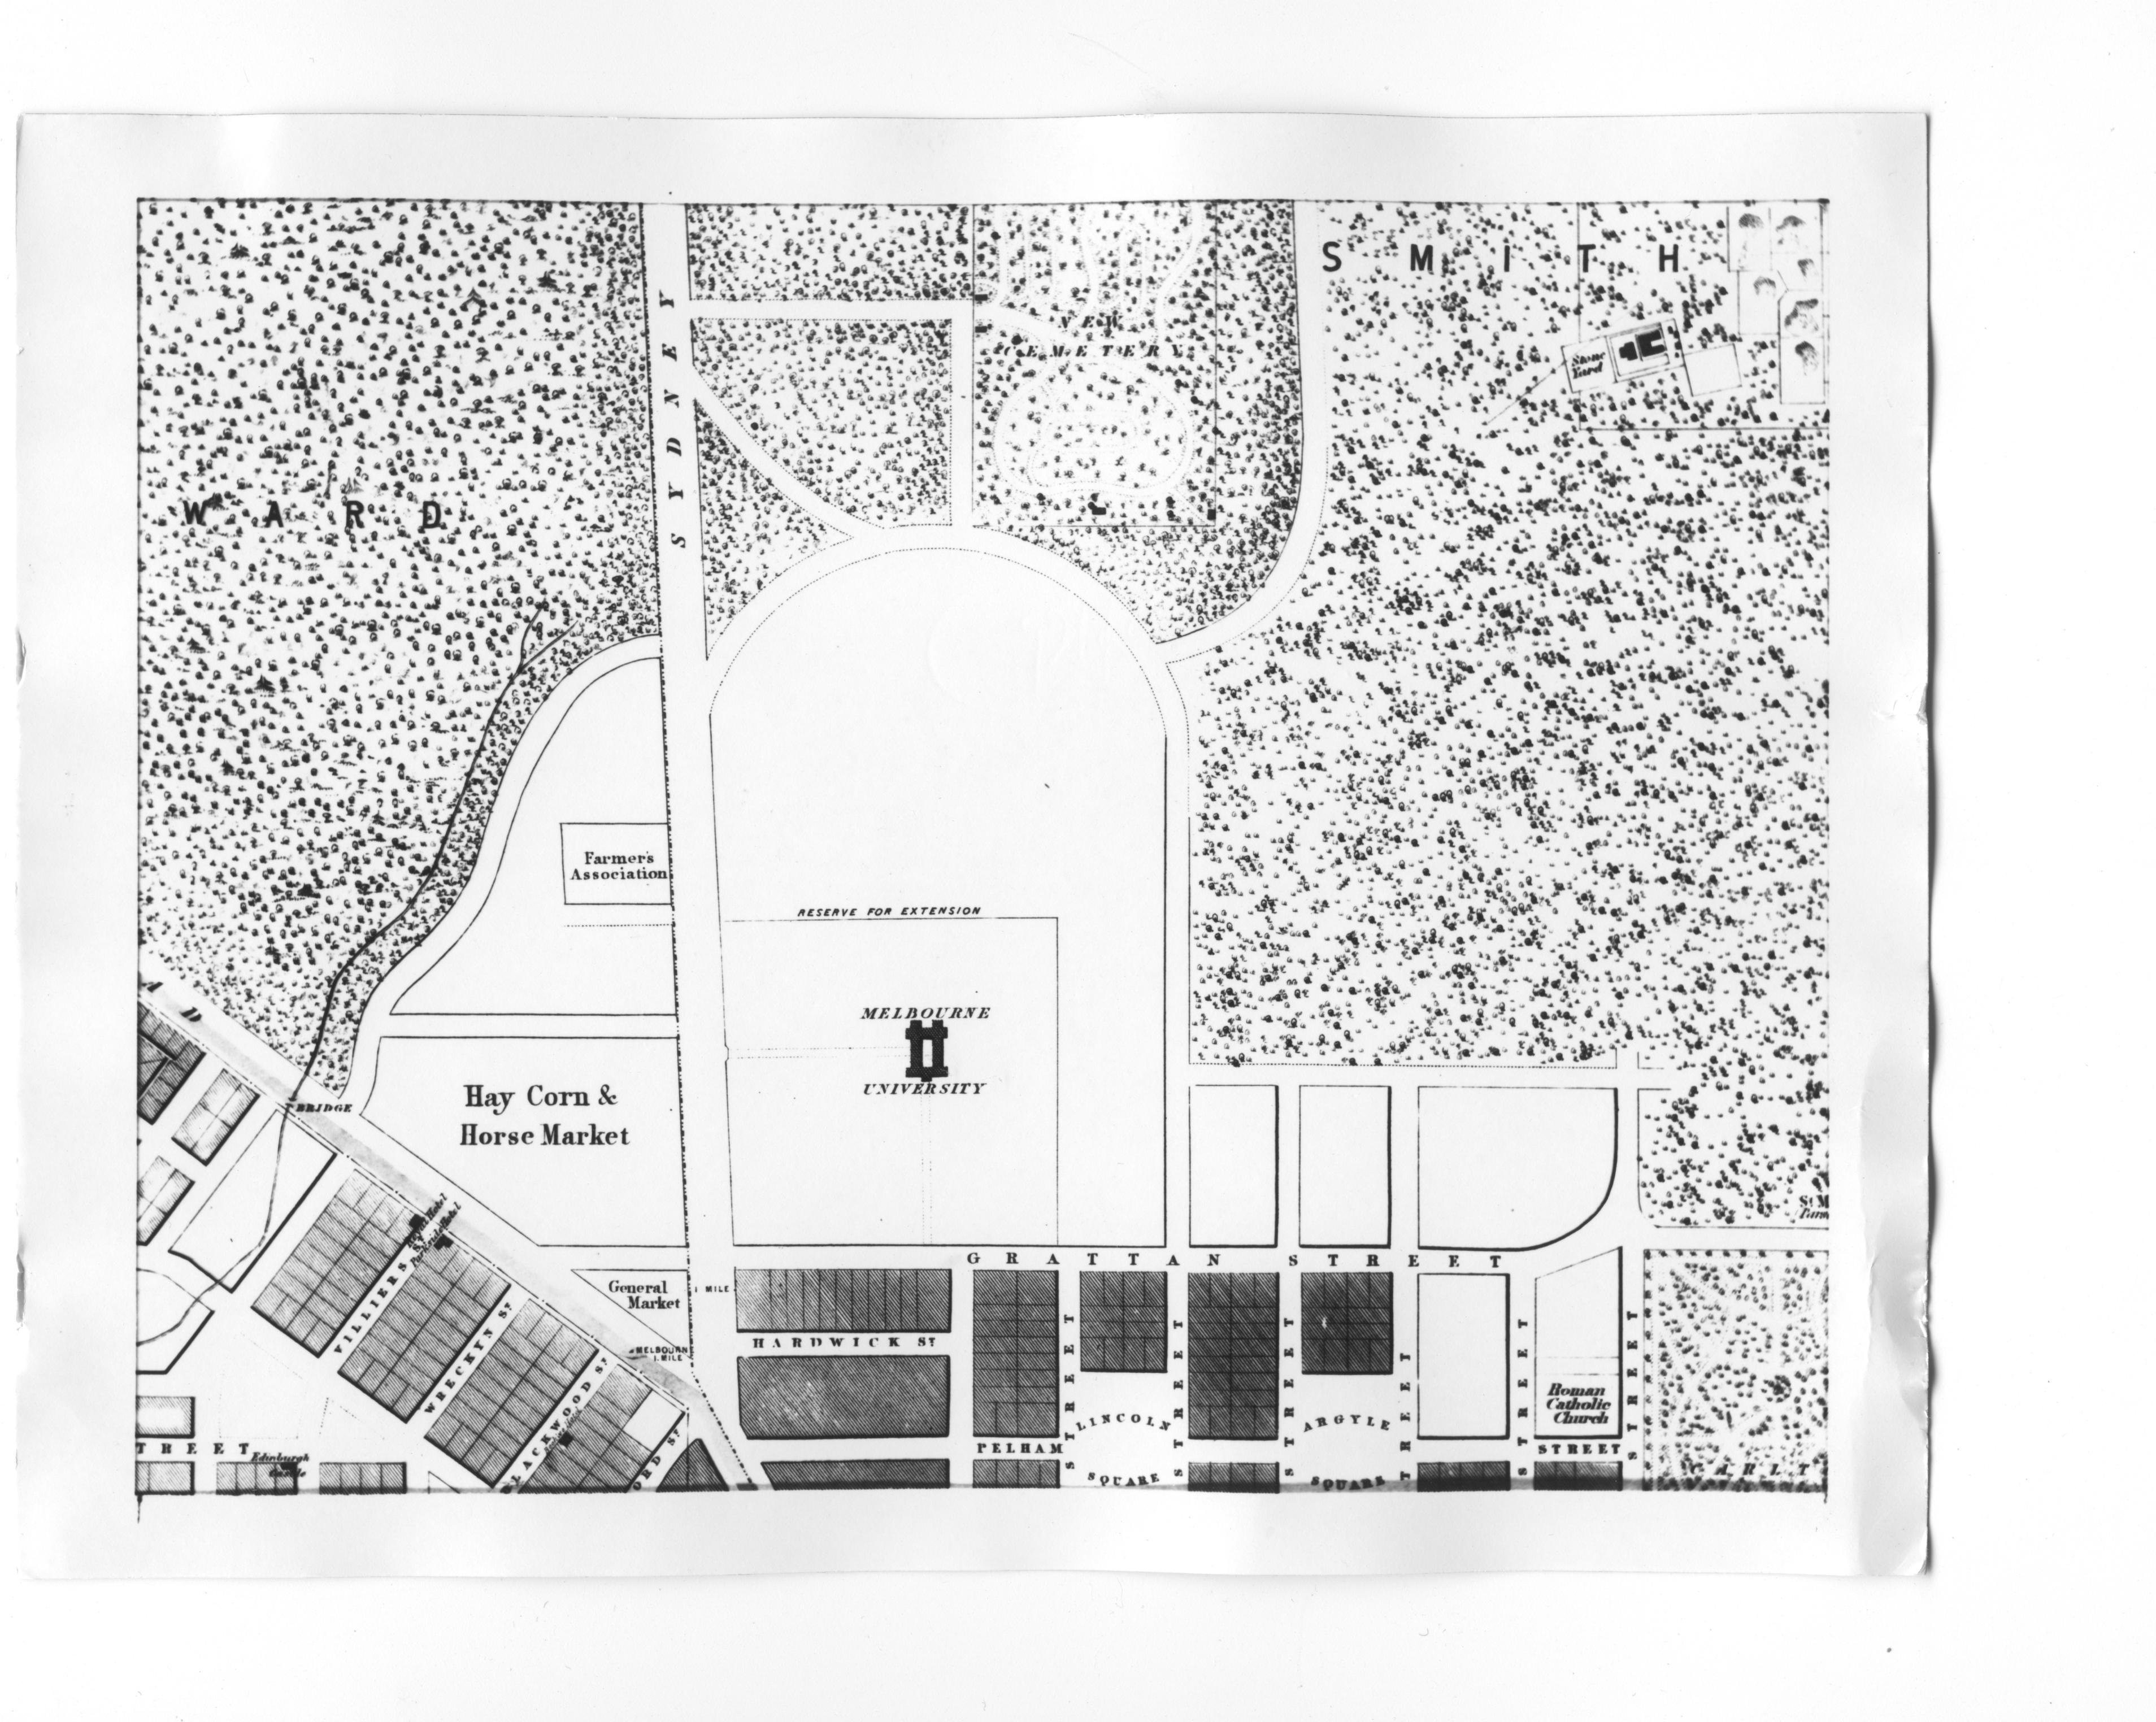 1855 locality plan with original University building